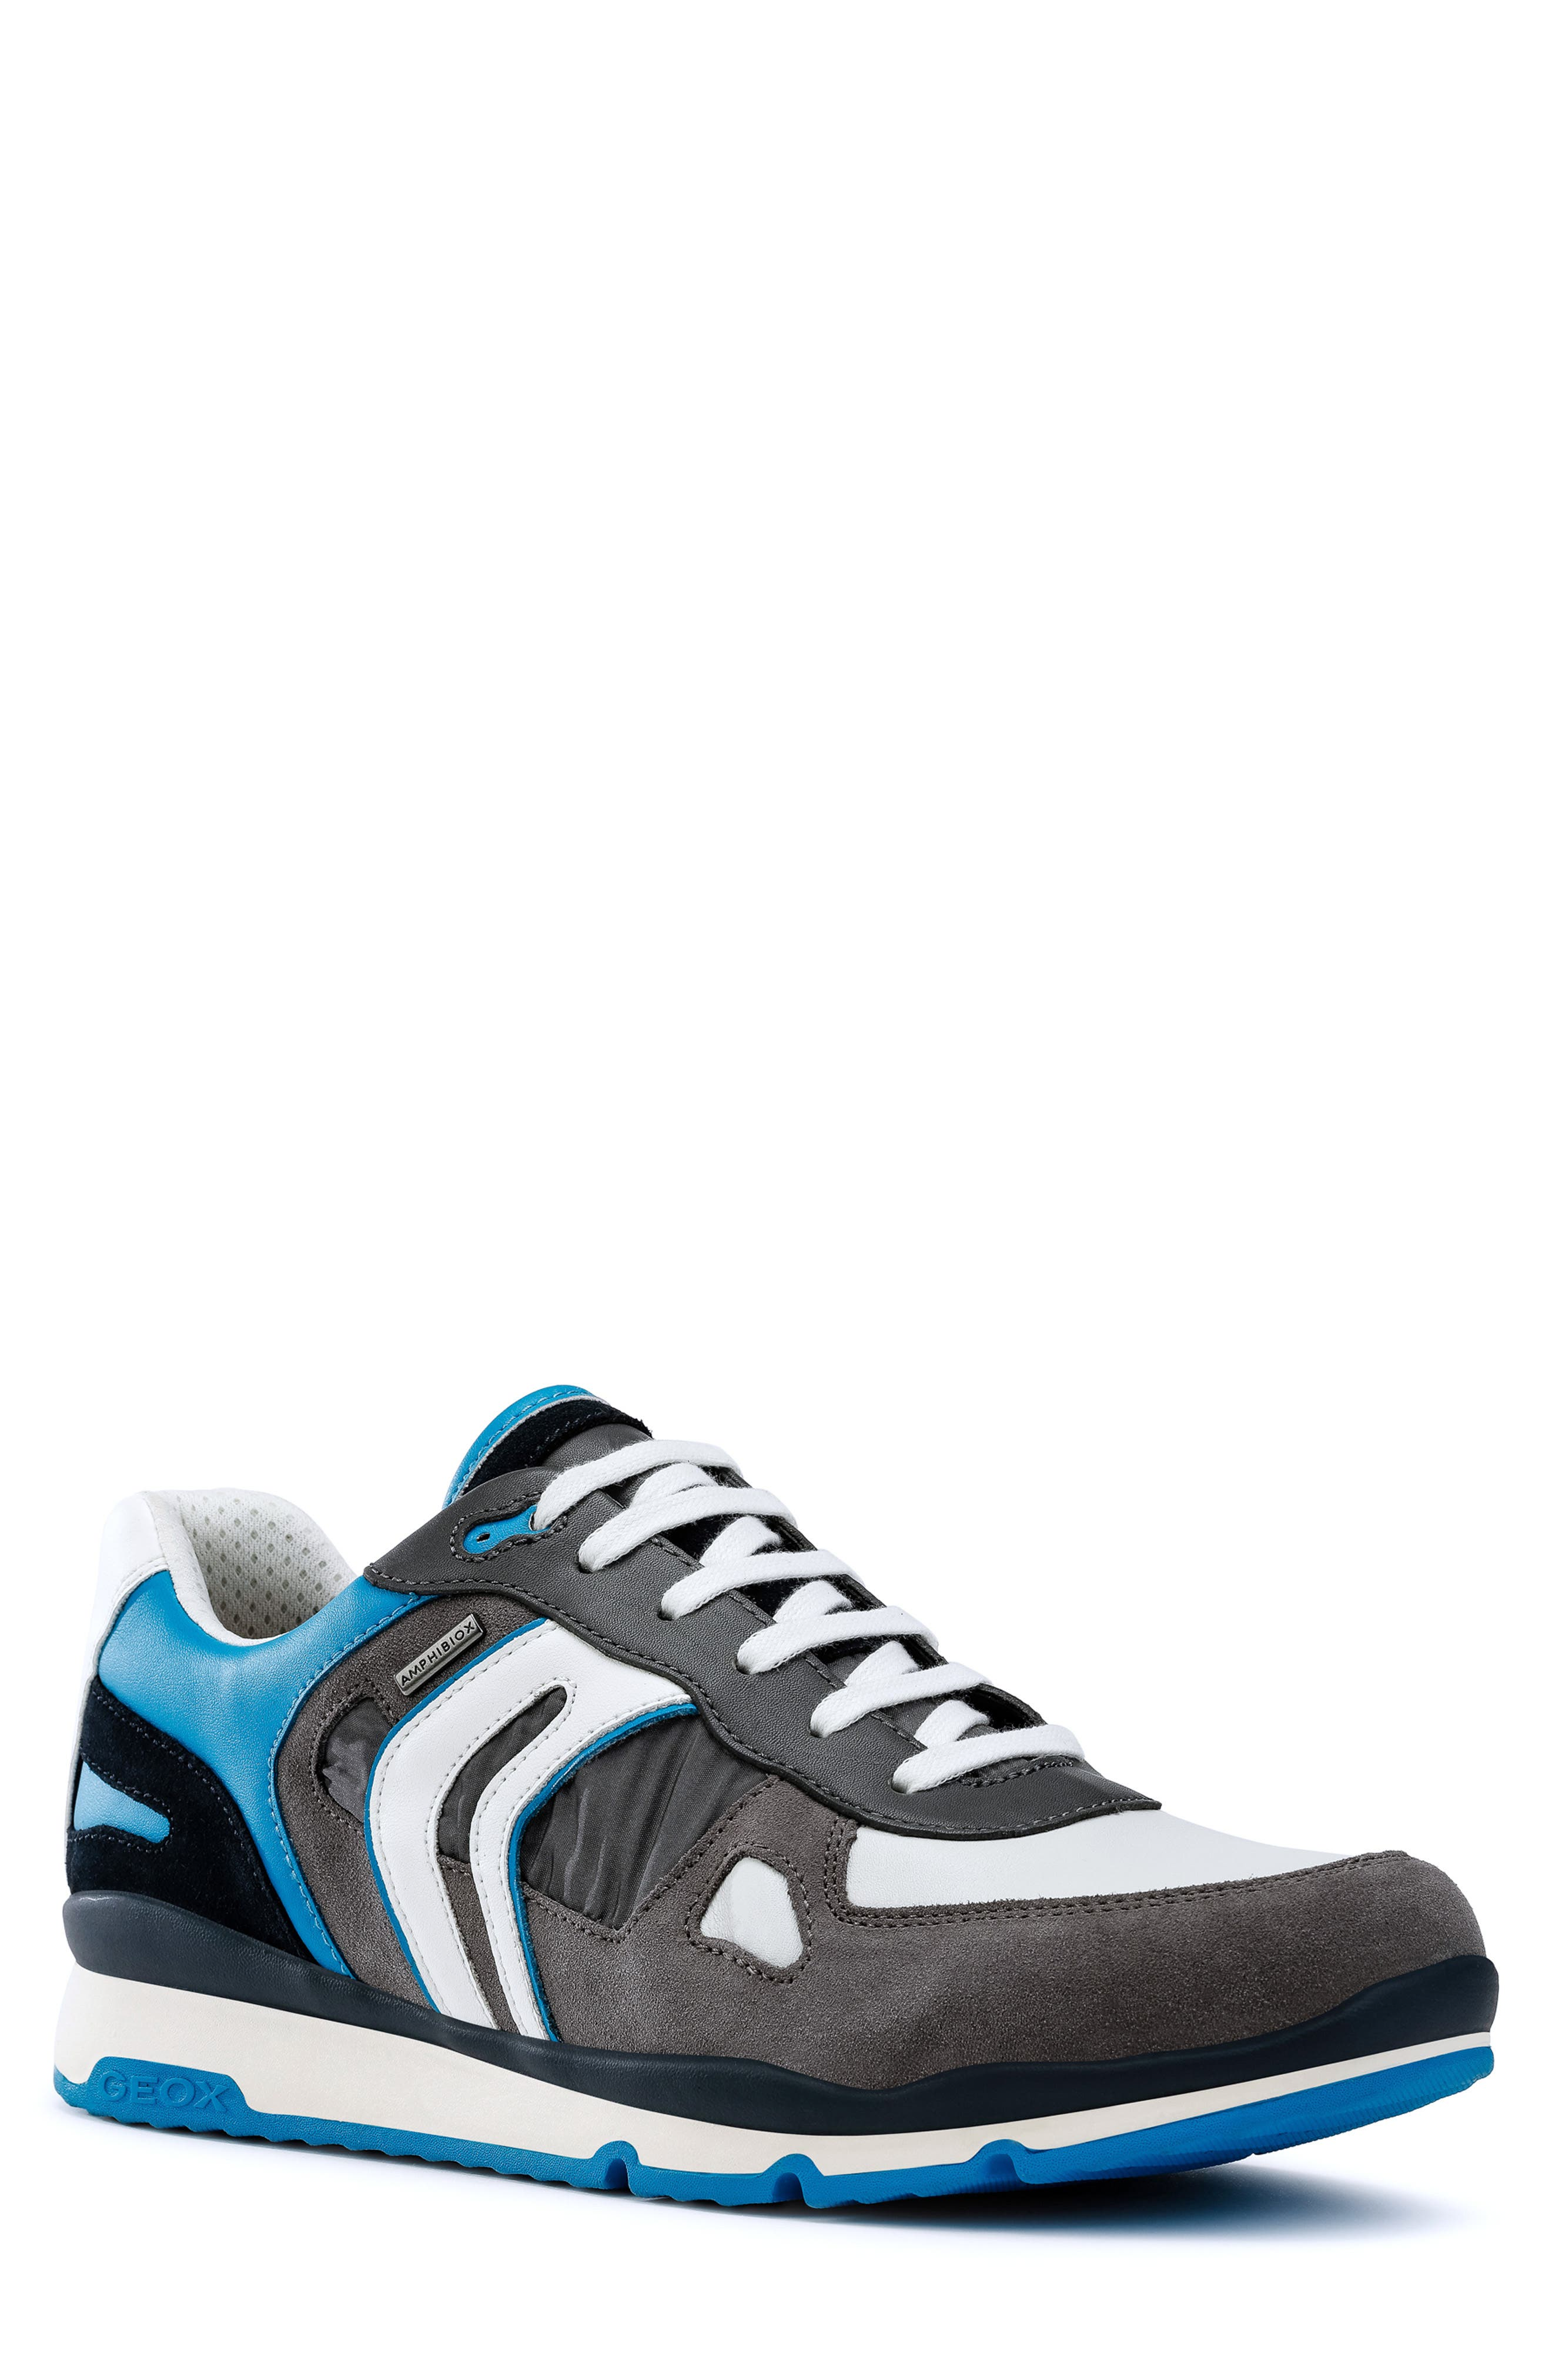 Geox Sandford Abx 2 Sneaker, Grey